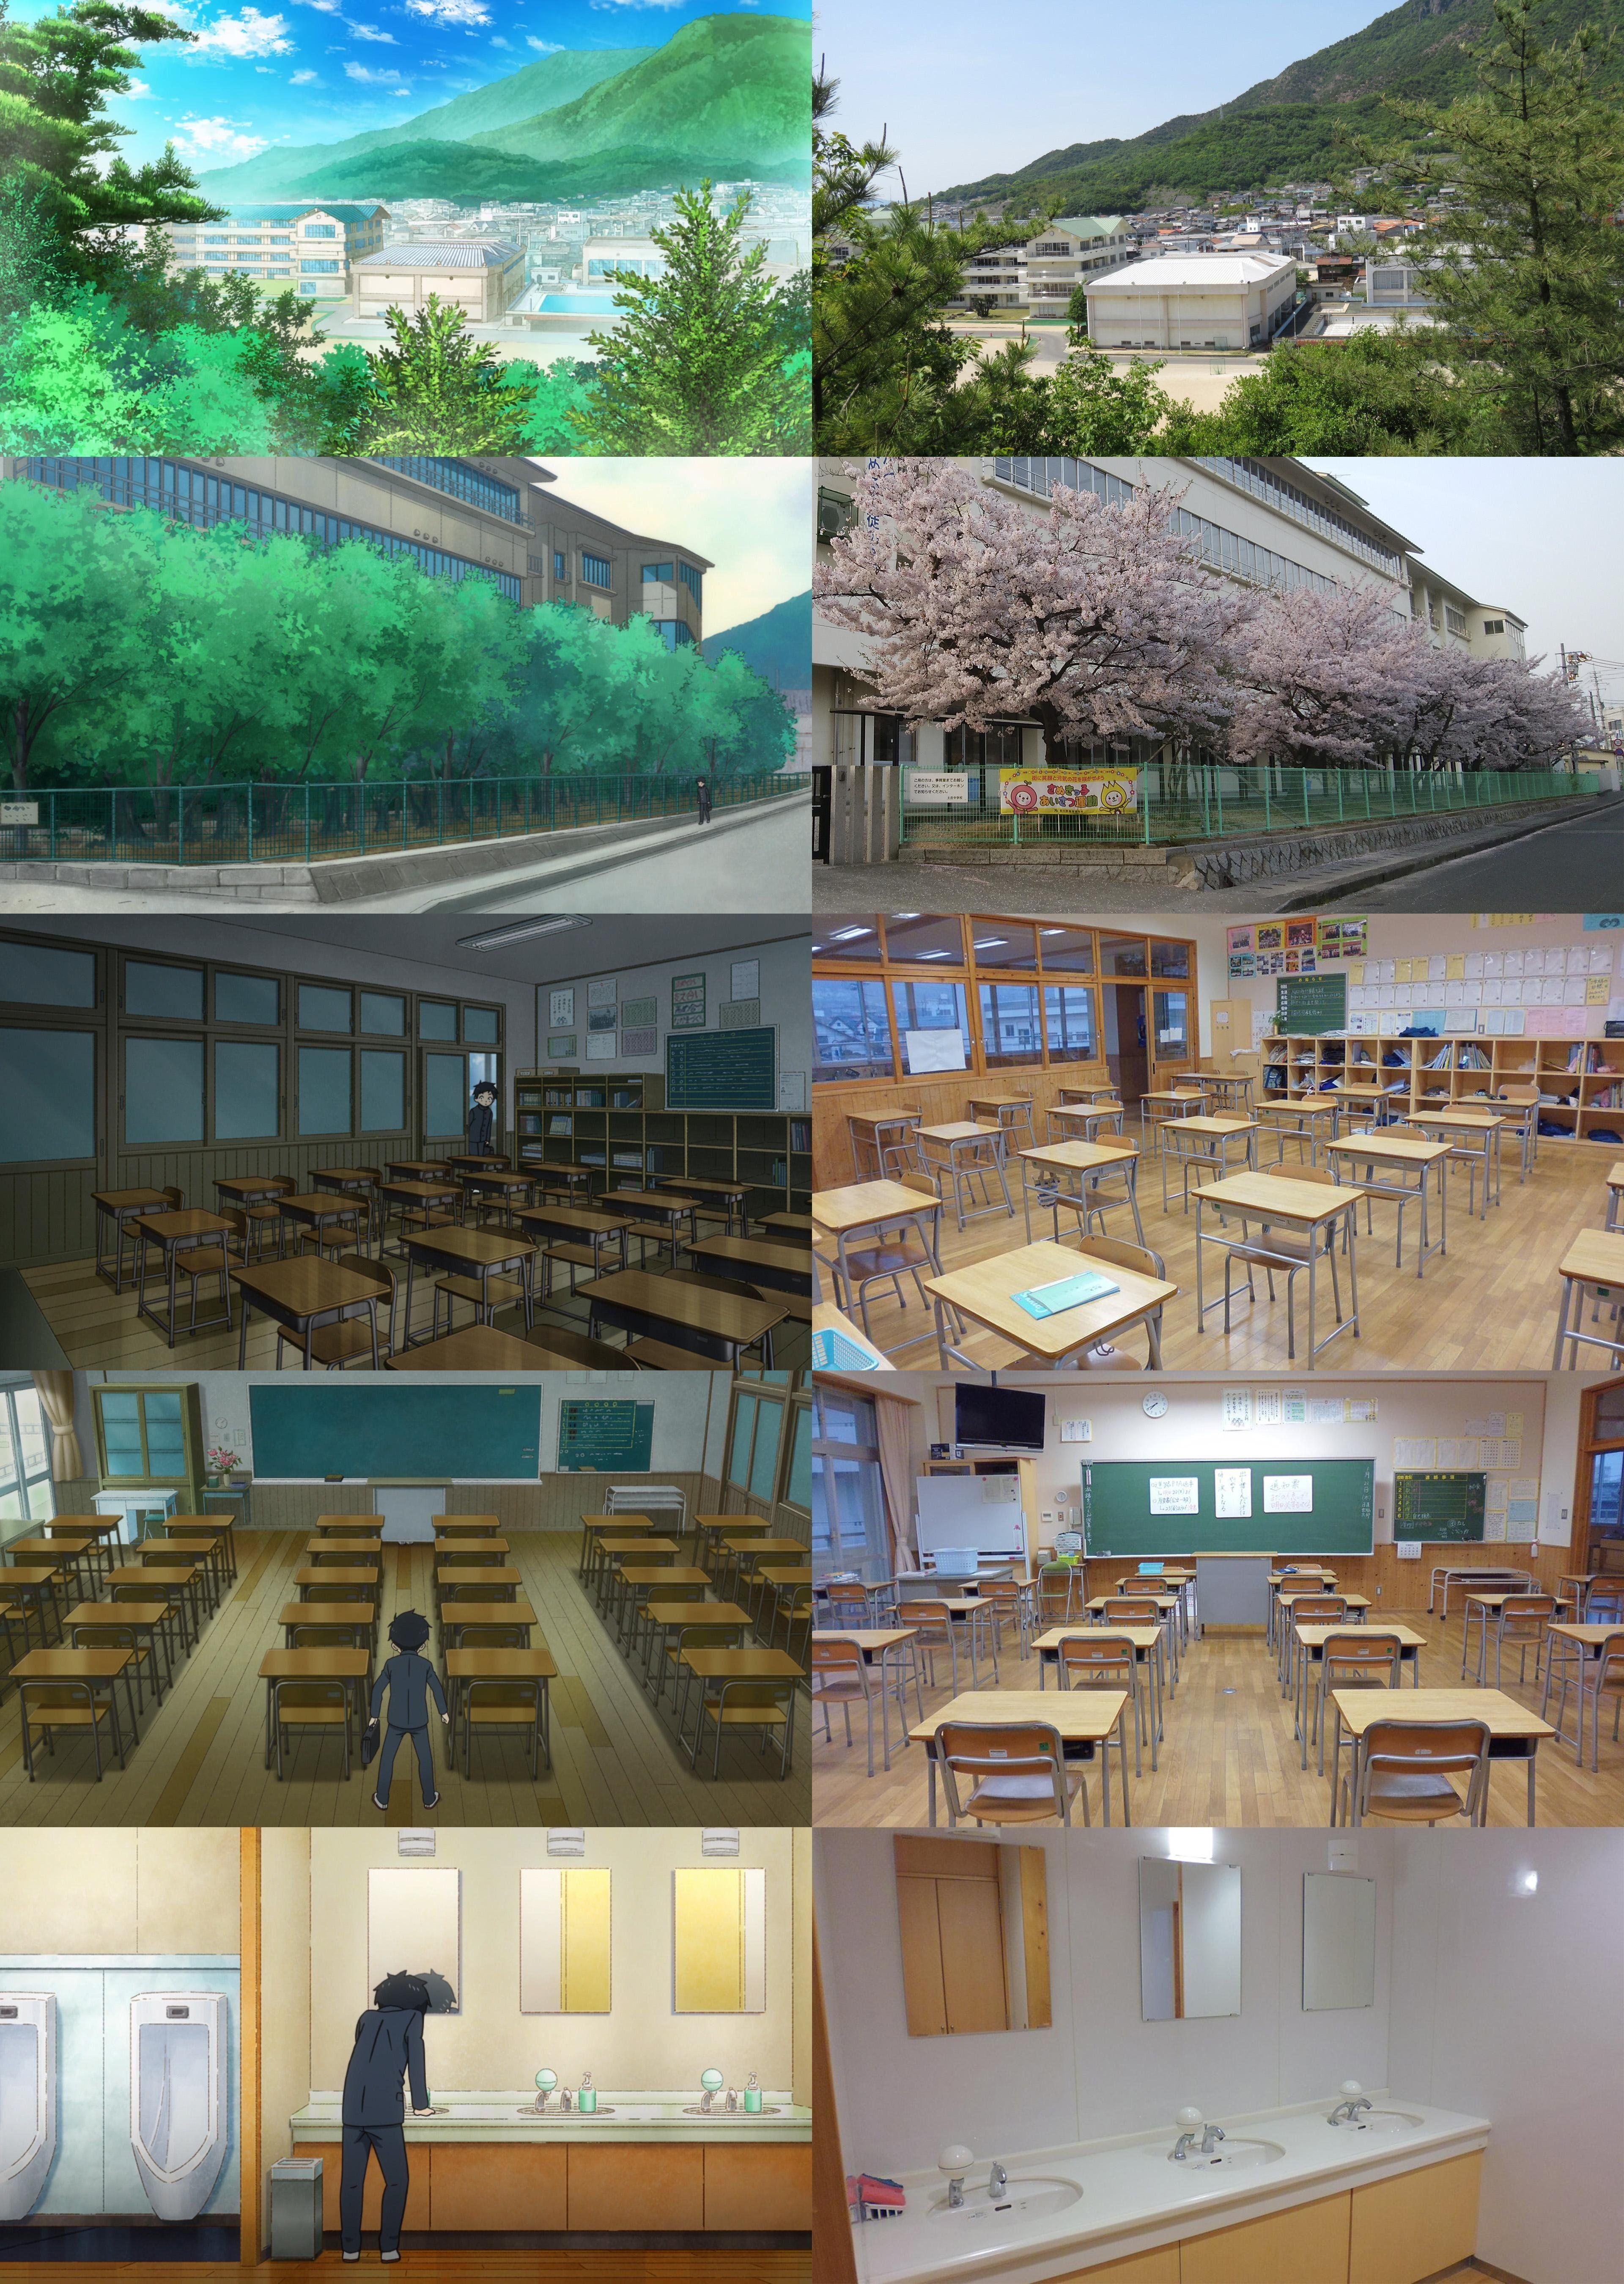 Takagi San Real Life Locations Episode 1 Takagi San からかい